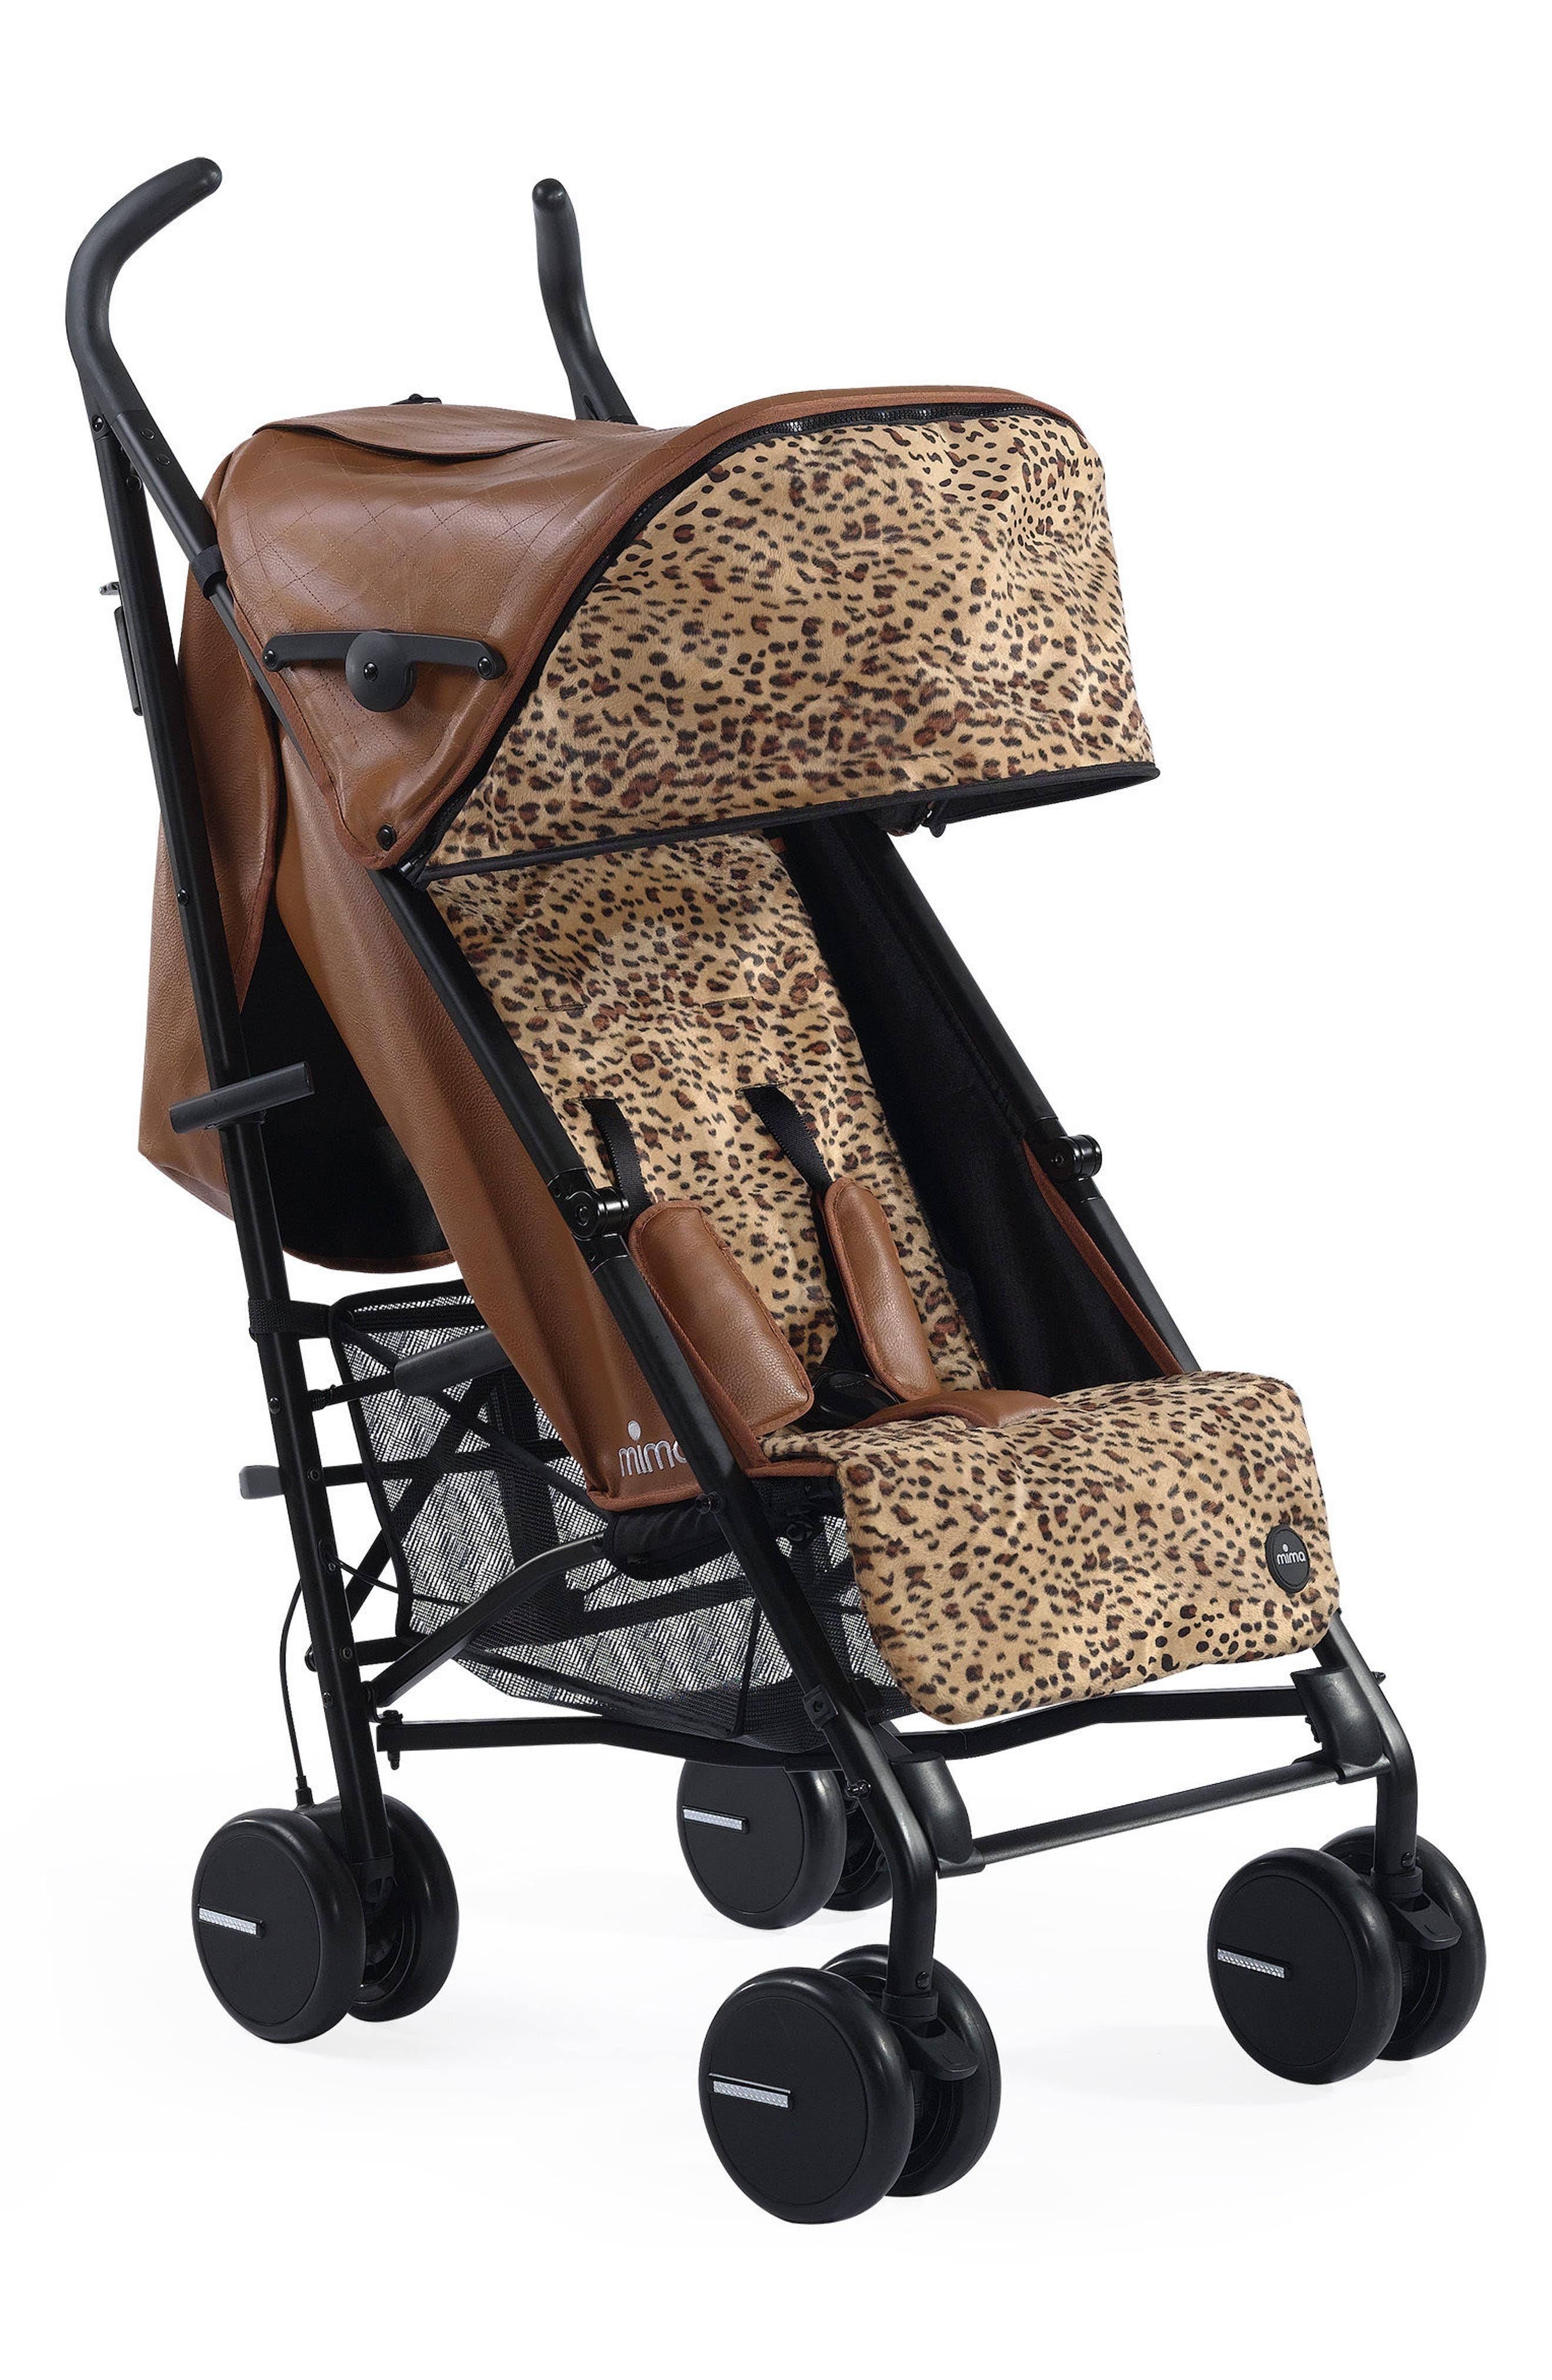 Main Image - Mima Sun Visor & Seat Liner Fabric Fashion Kit for Mima Bo Stroller